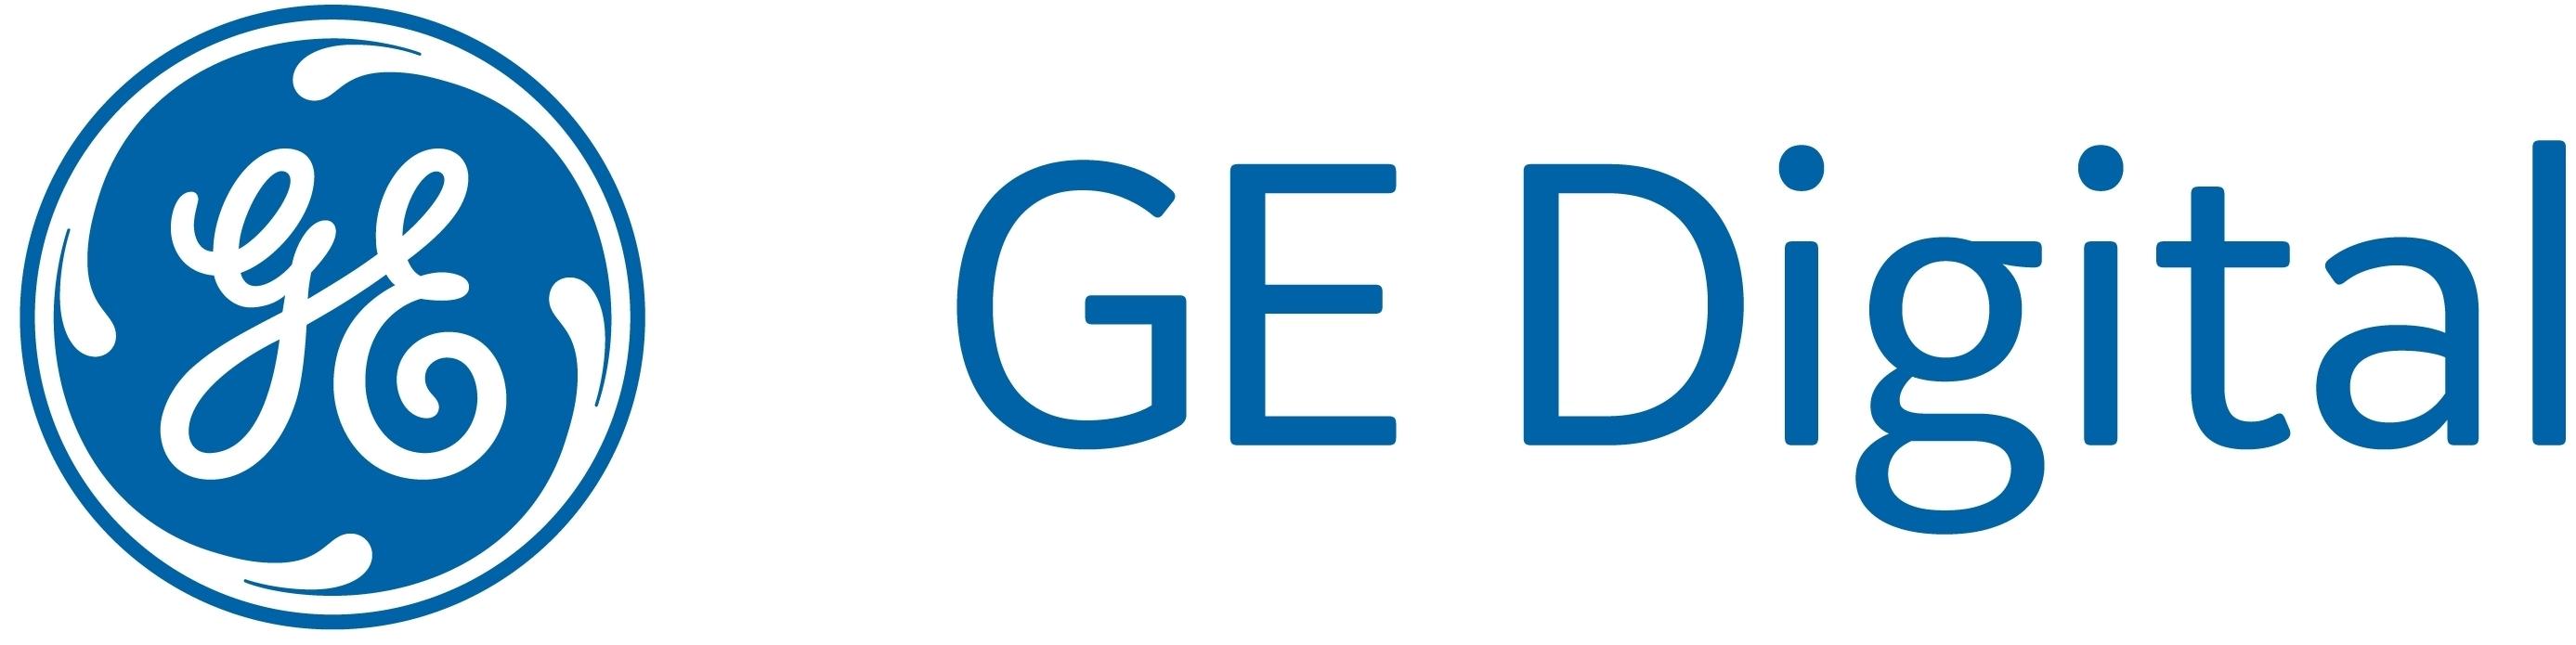 AW-GE_Digital_Isologotype_Sans_Blue